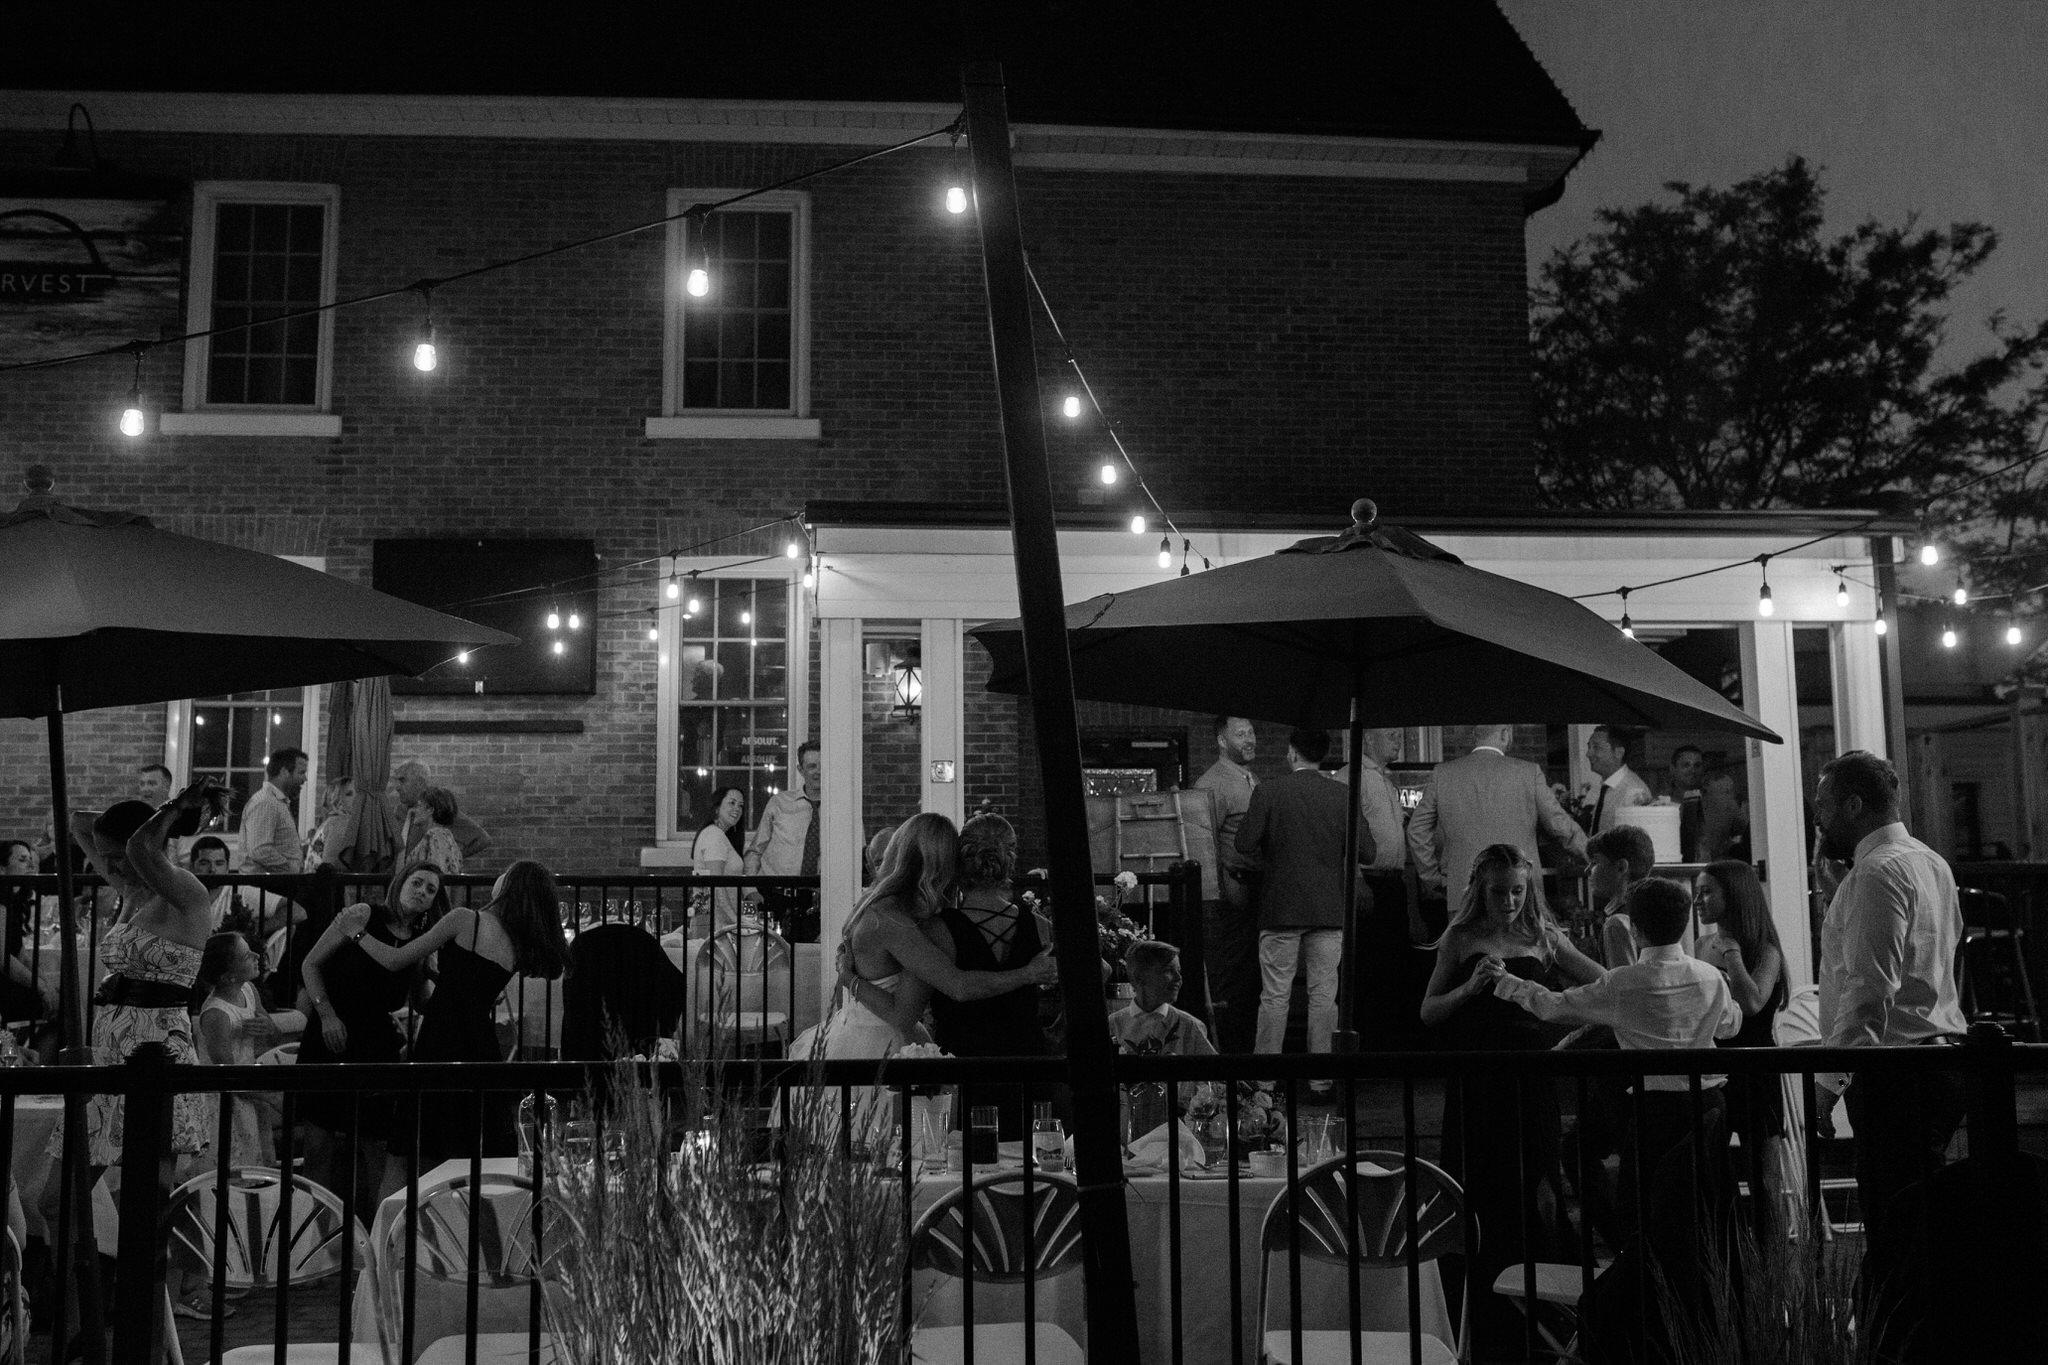 Harvest Restaurant Wedding Brooklin Ontario - Intimate family wedding on the patio